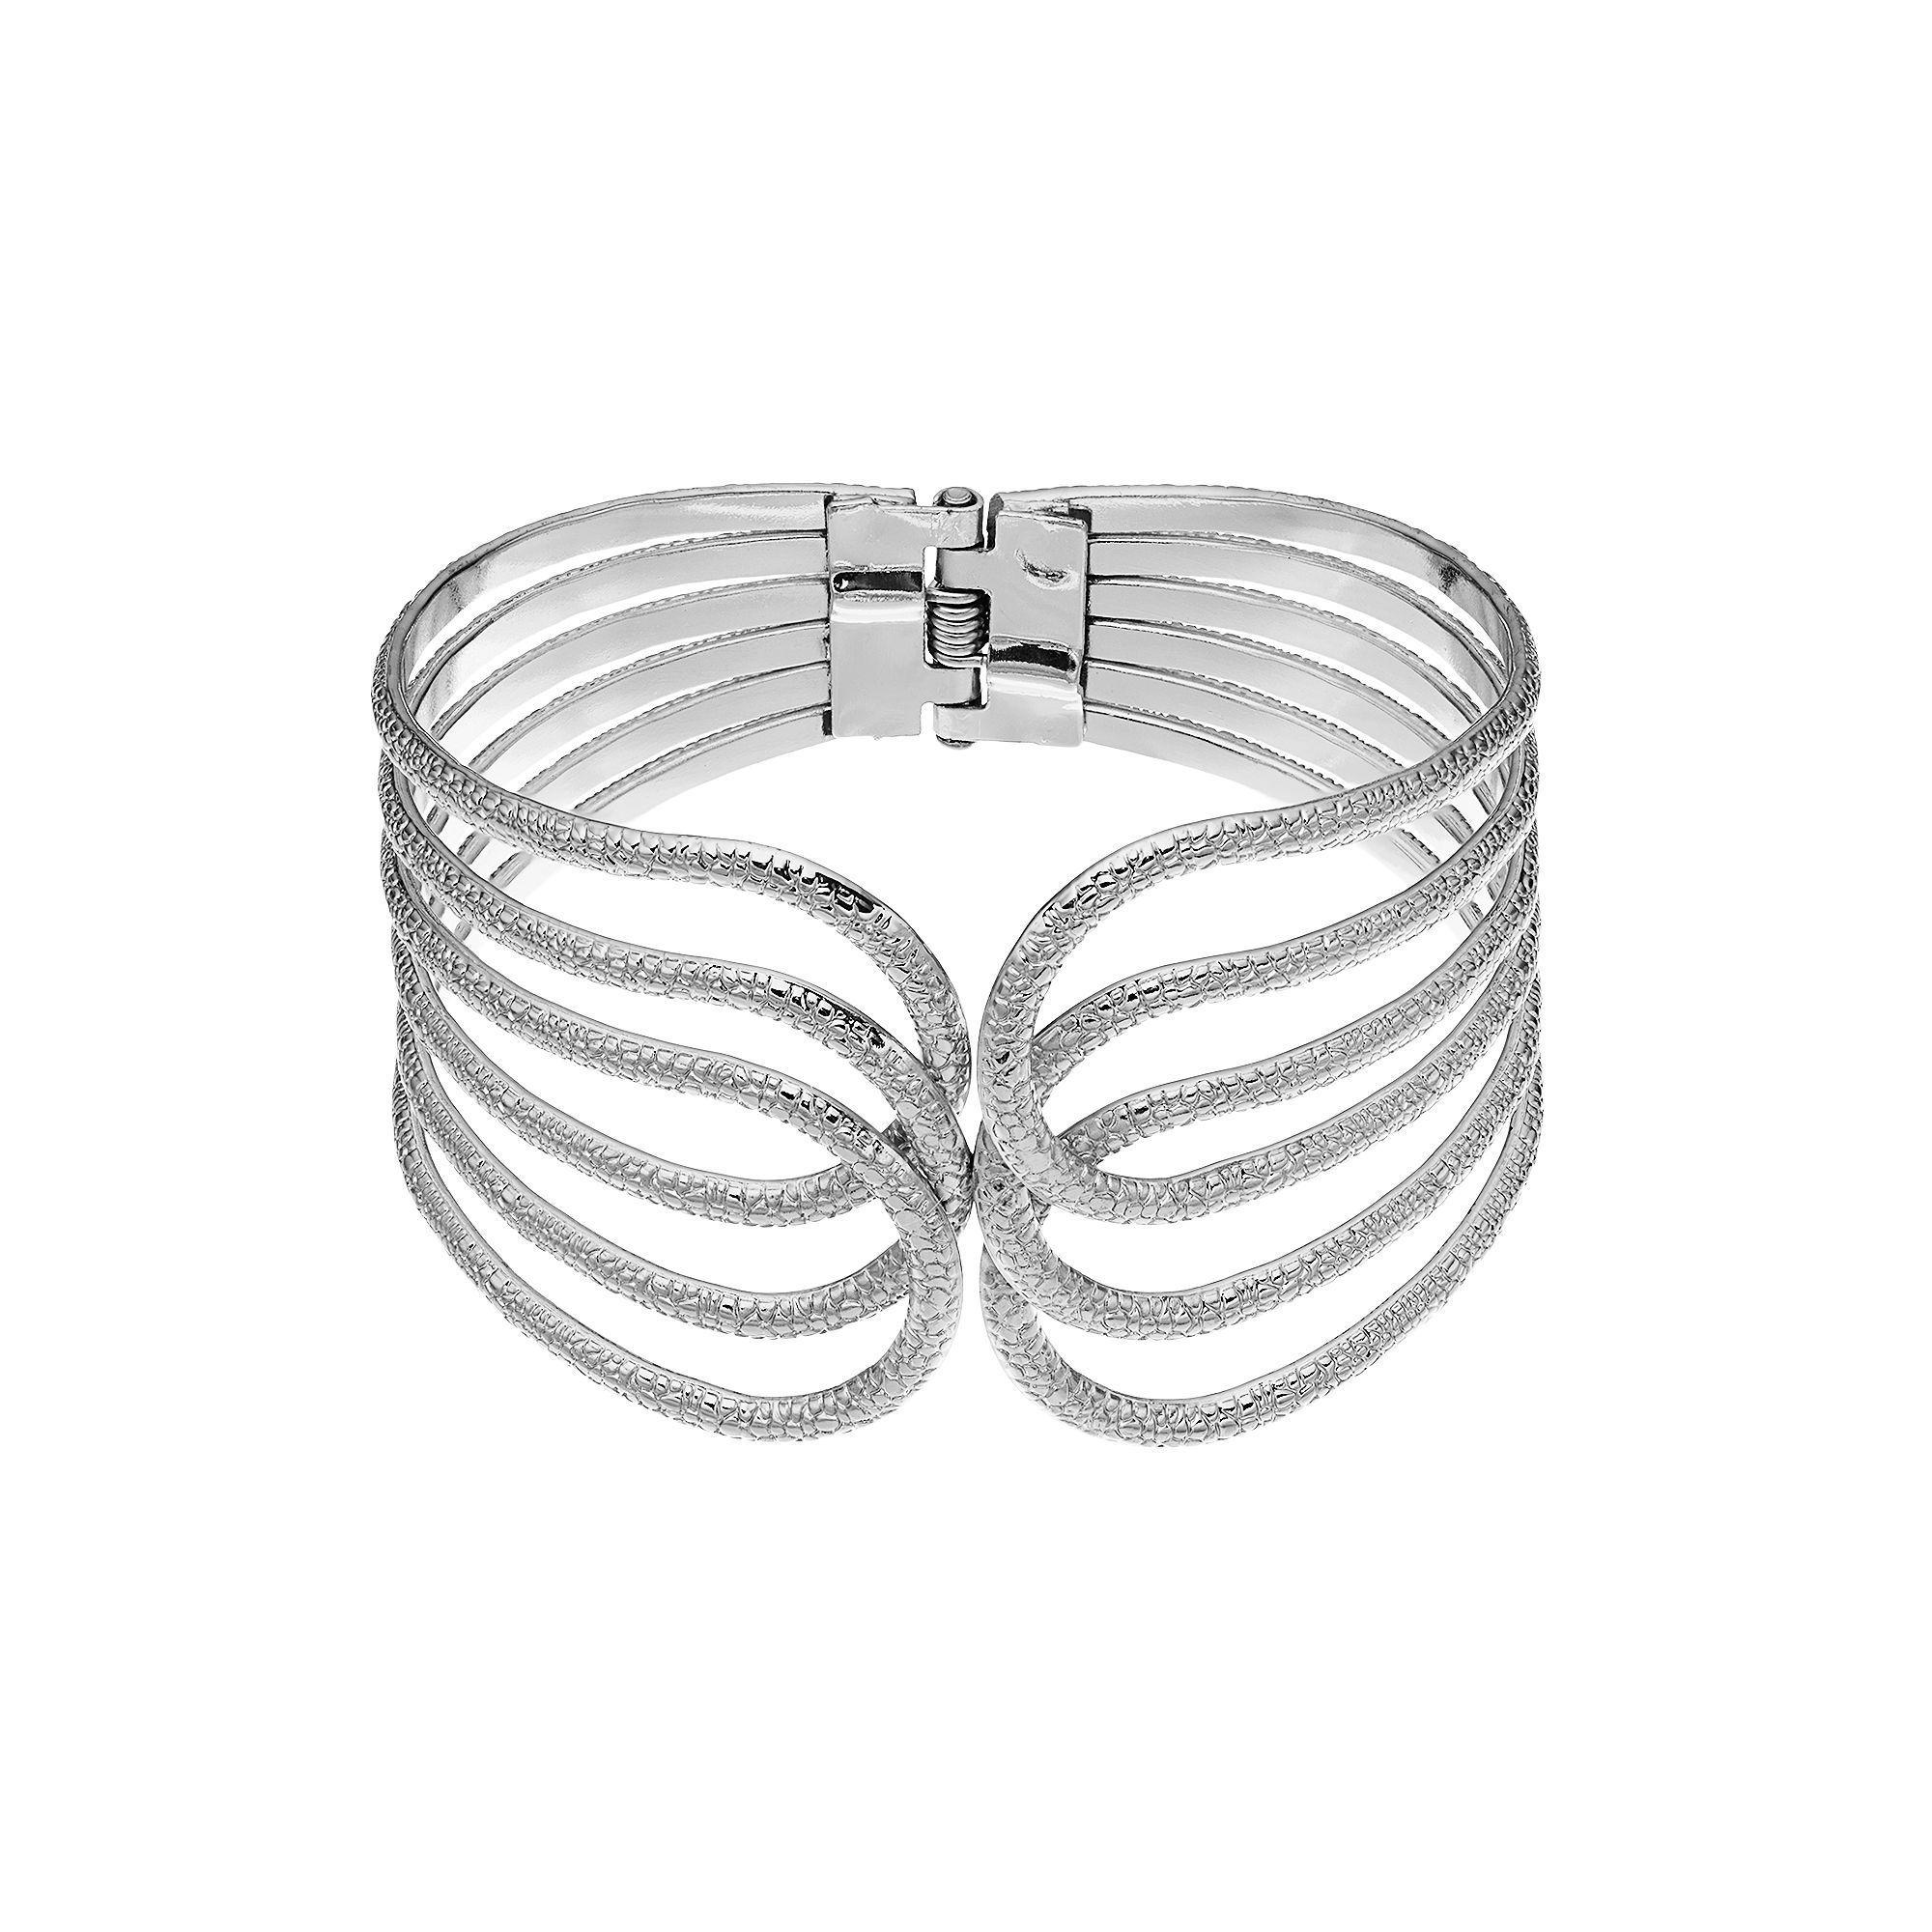 Plus size textured openwork bangle bracelet womenus silver